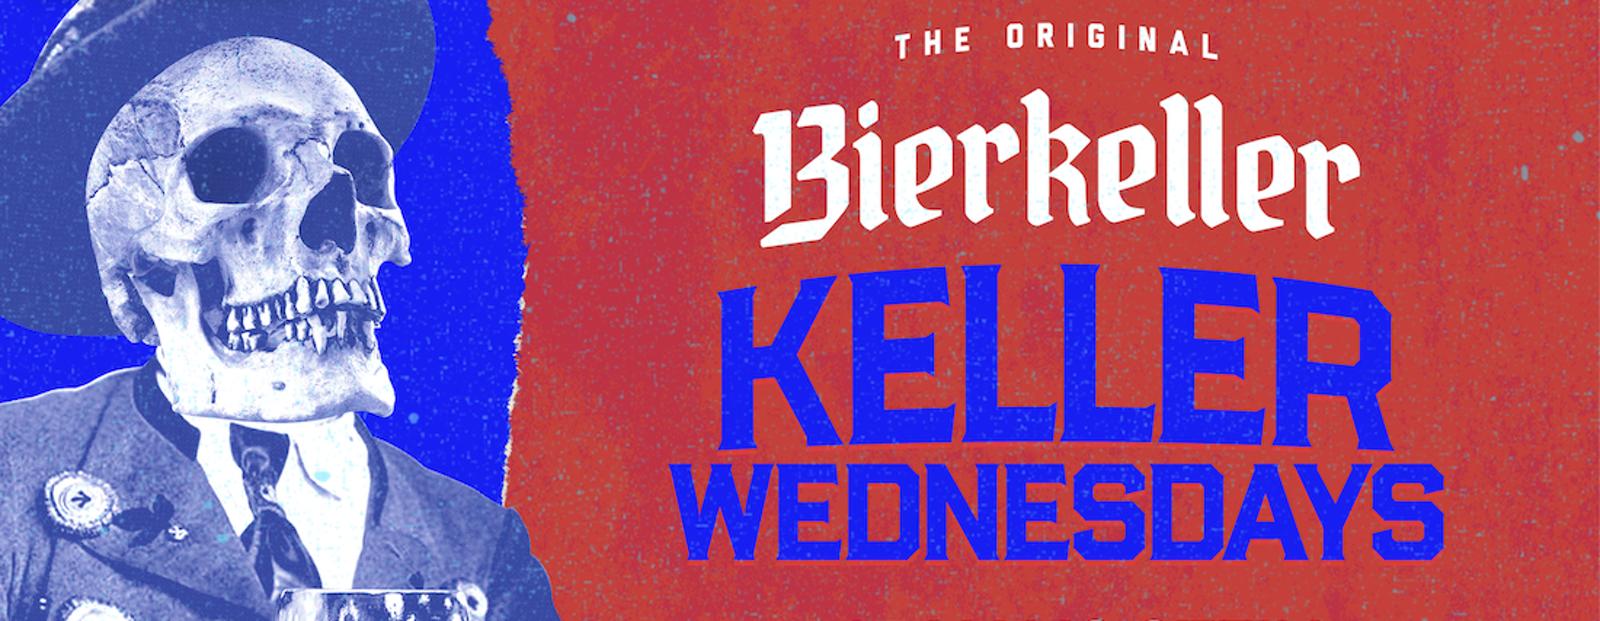 Wednesday: Keller Wednesday